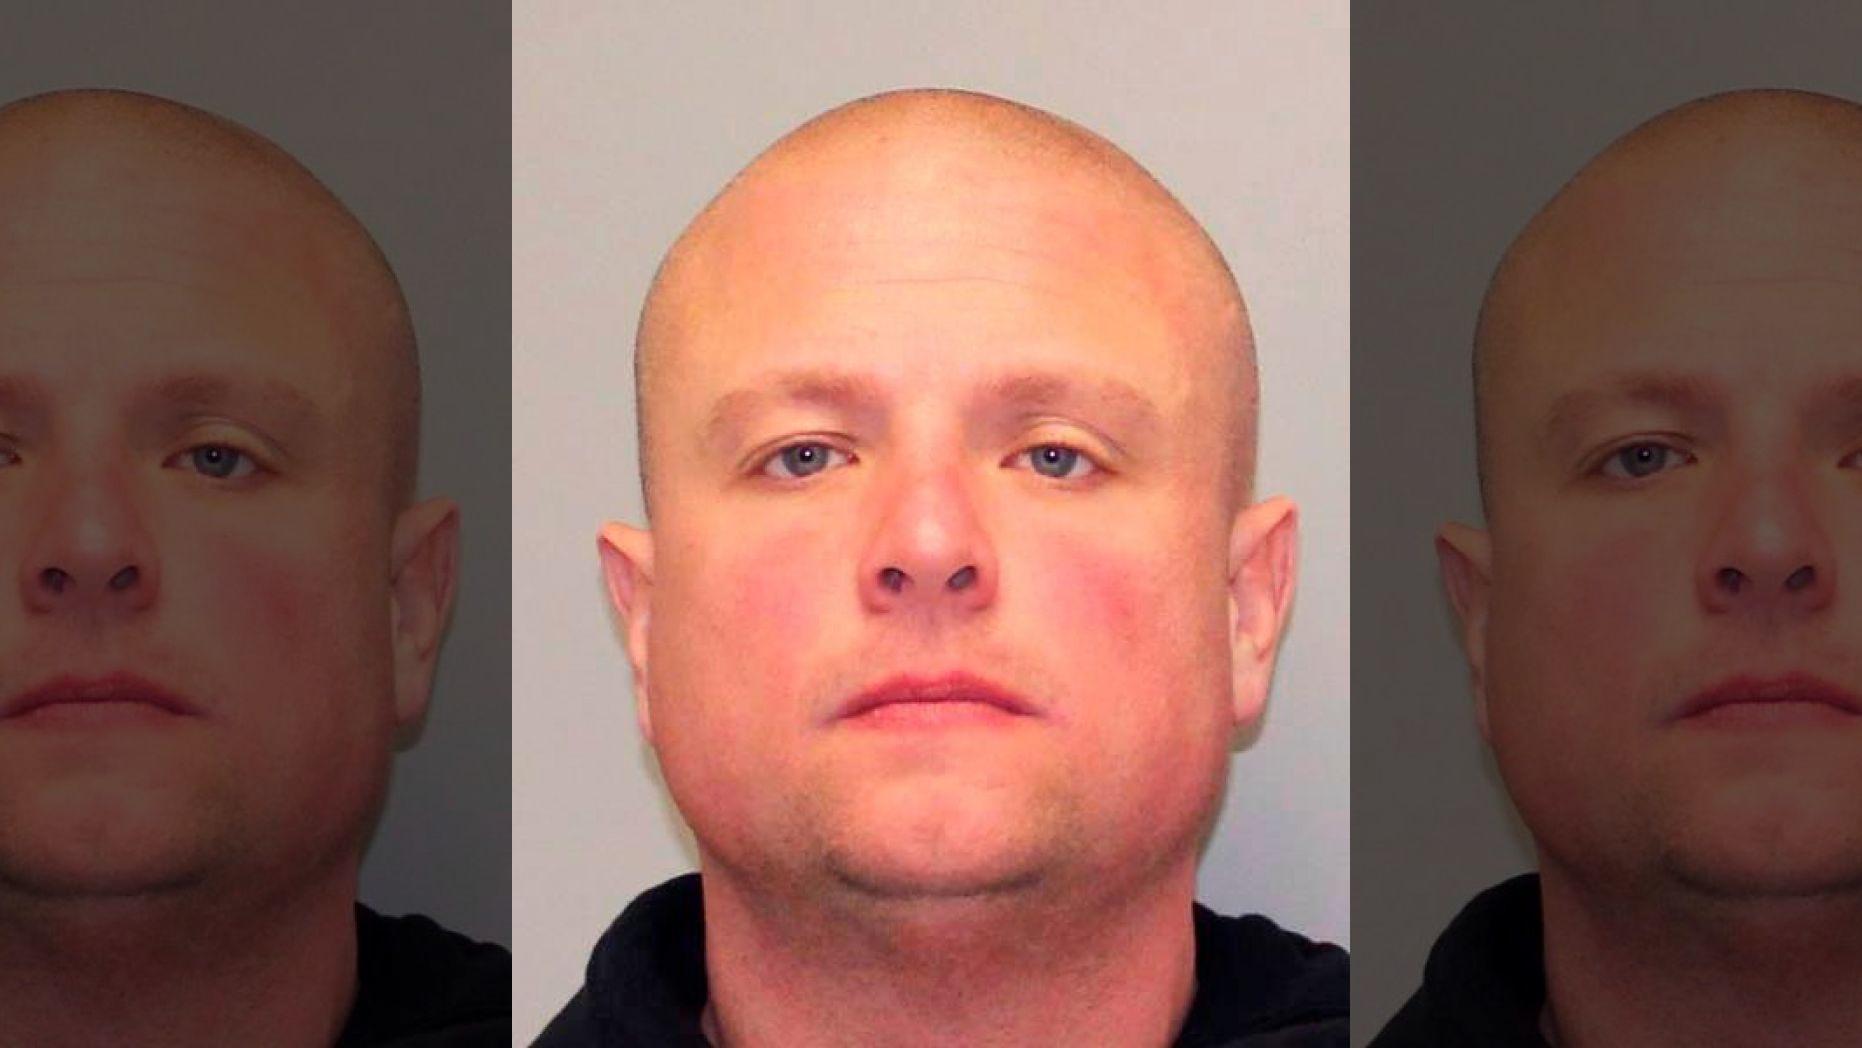 Environmental Protection Police Sergeant Gregg Marinelli